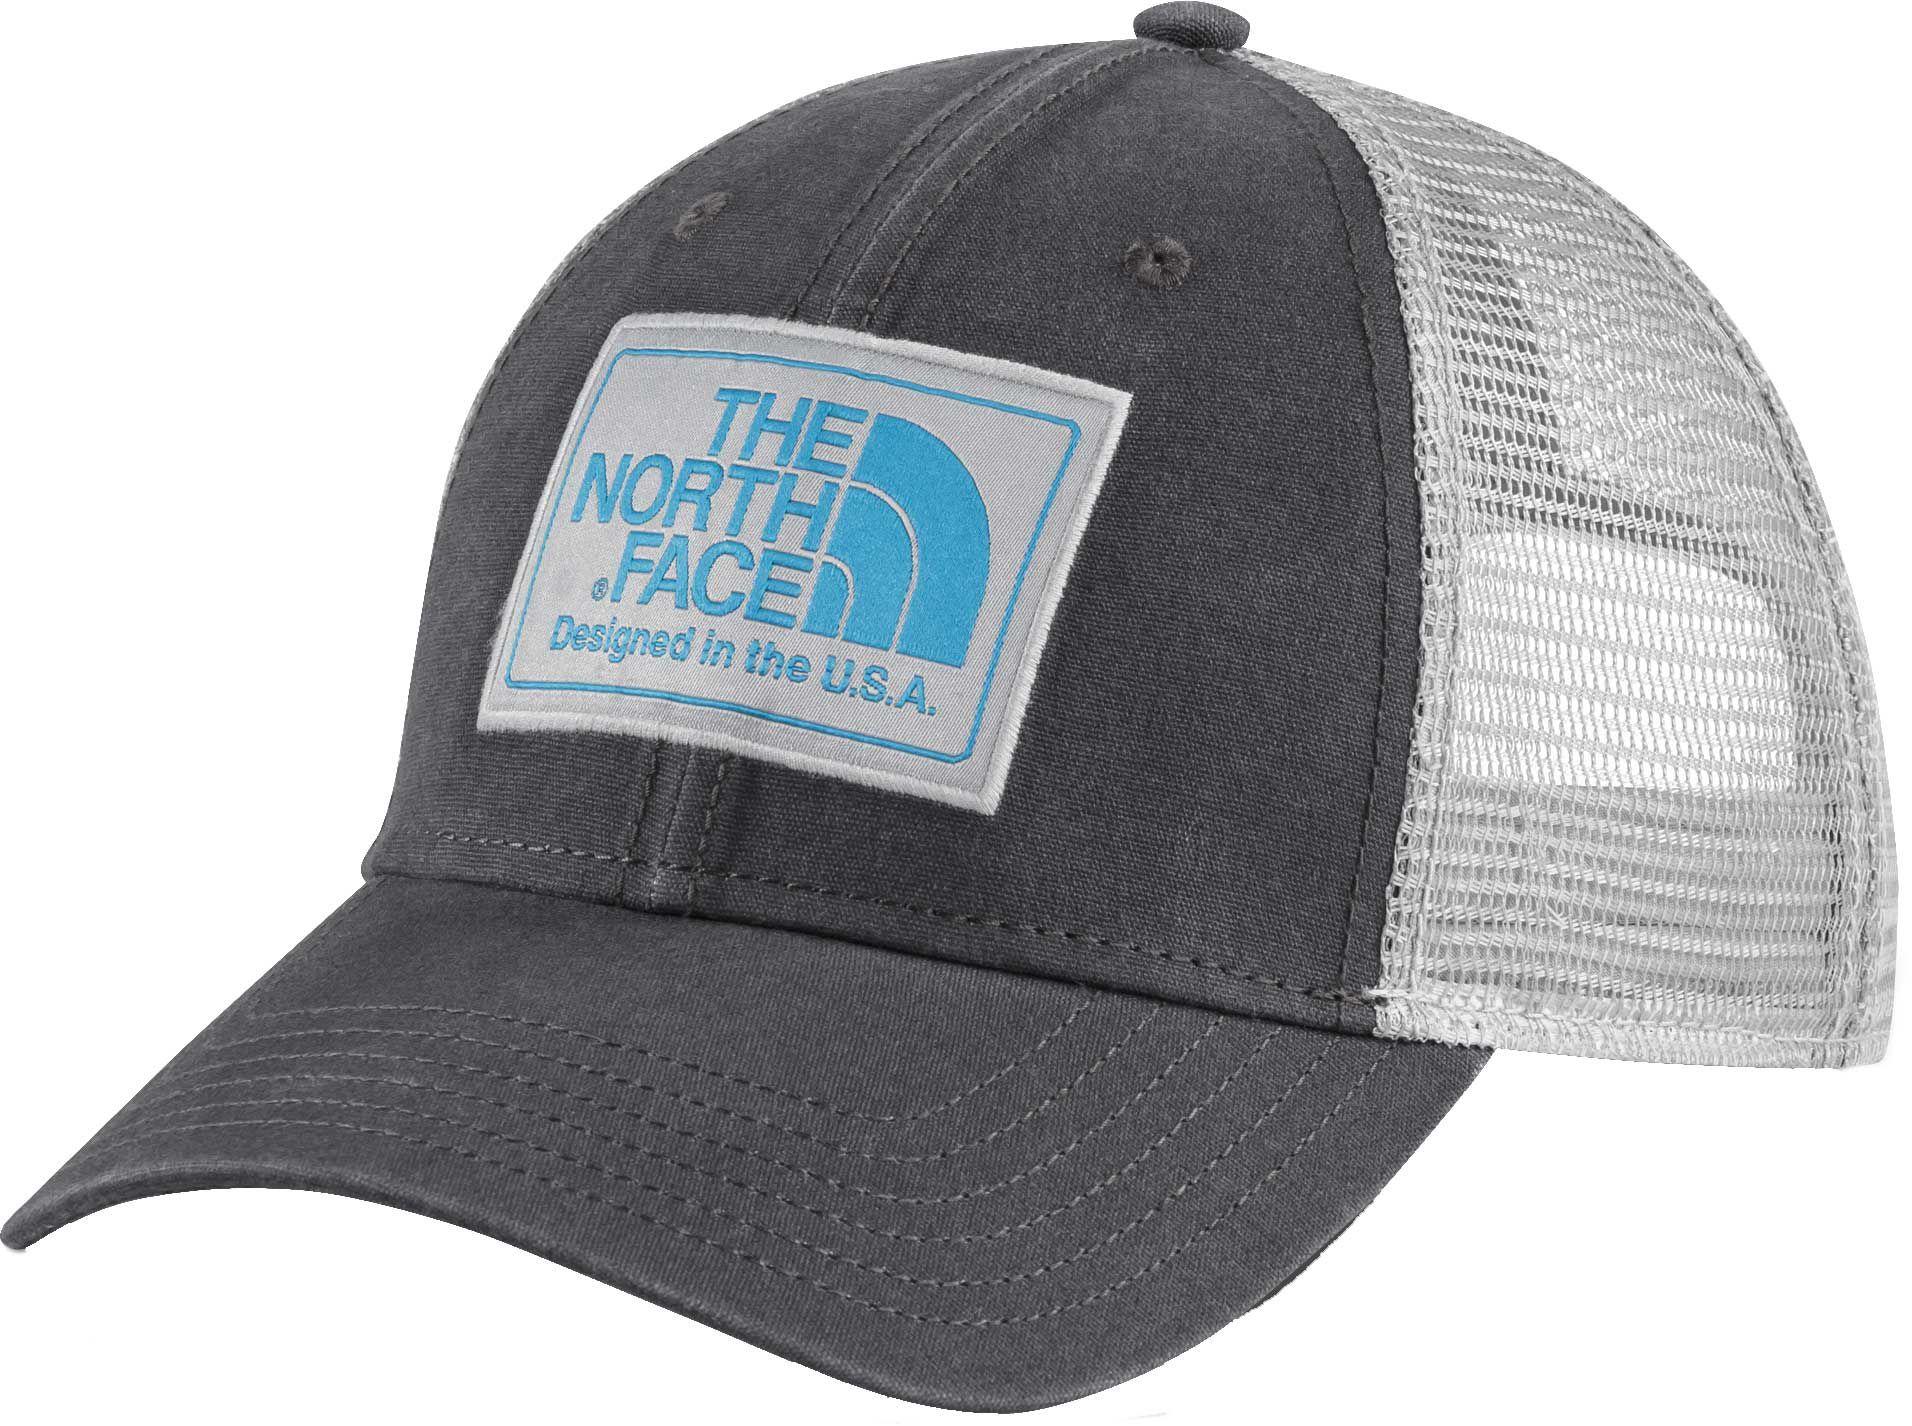 29cfea1b rugged hats | Furniture Shop